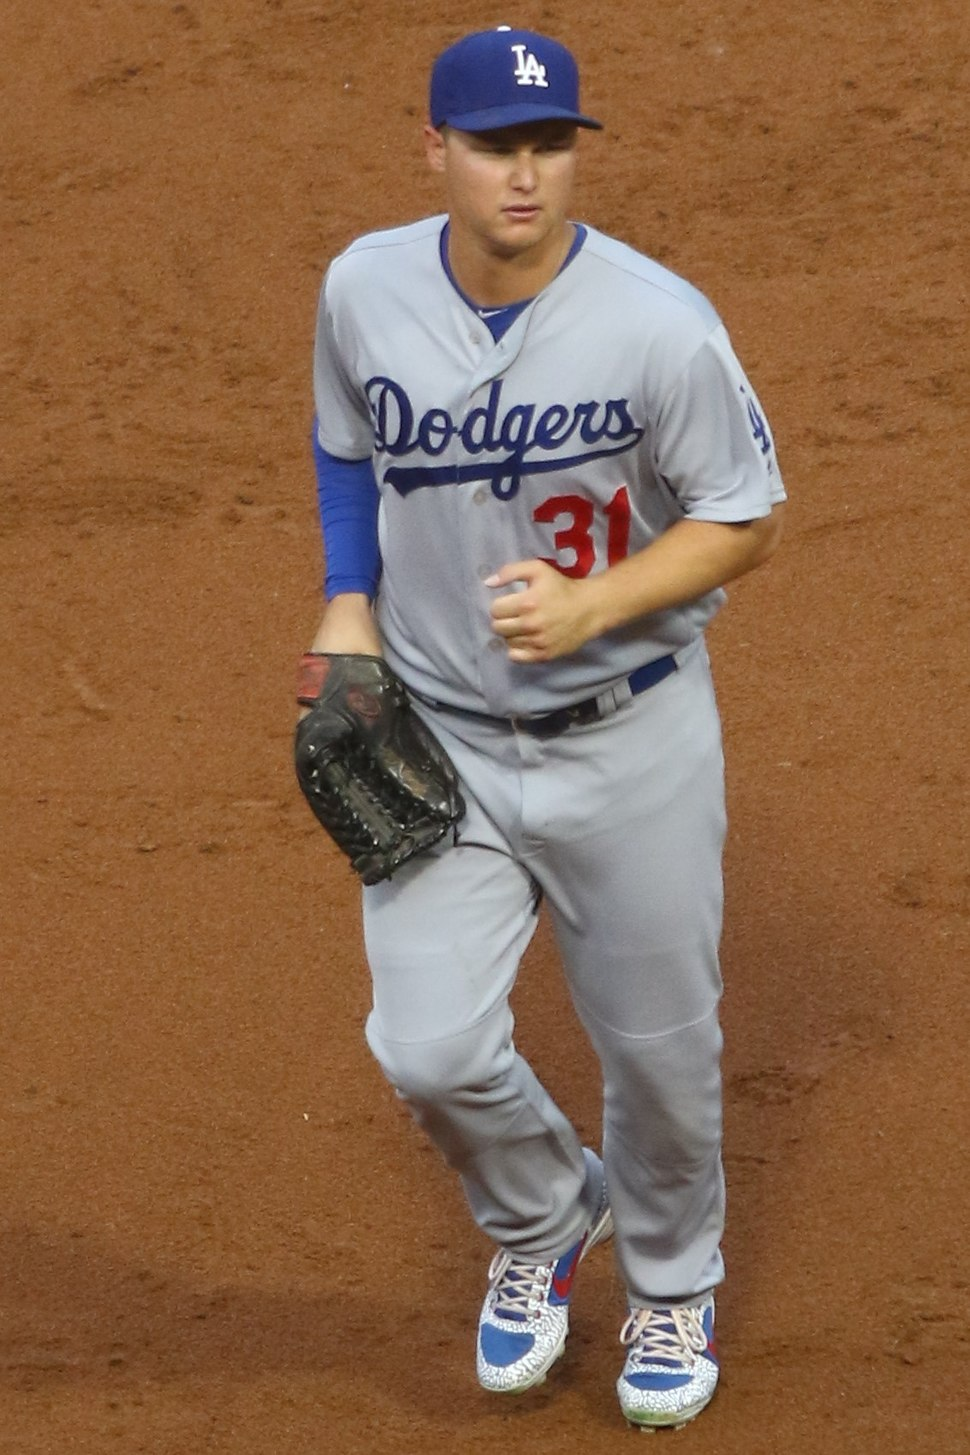 20170718 Dodgers-WhiteSox Joc Pederson leaving the field